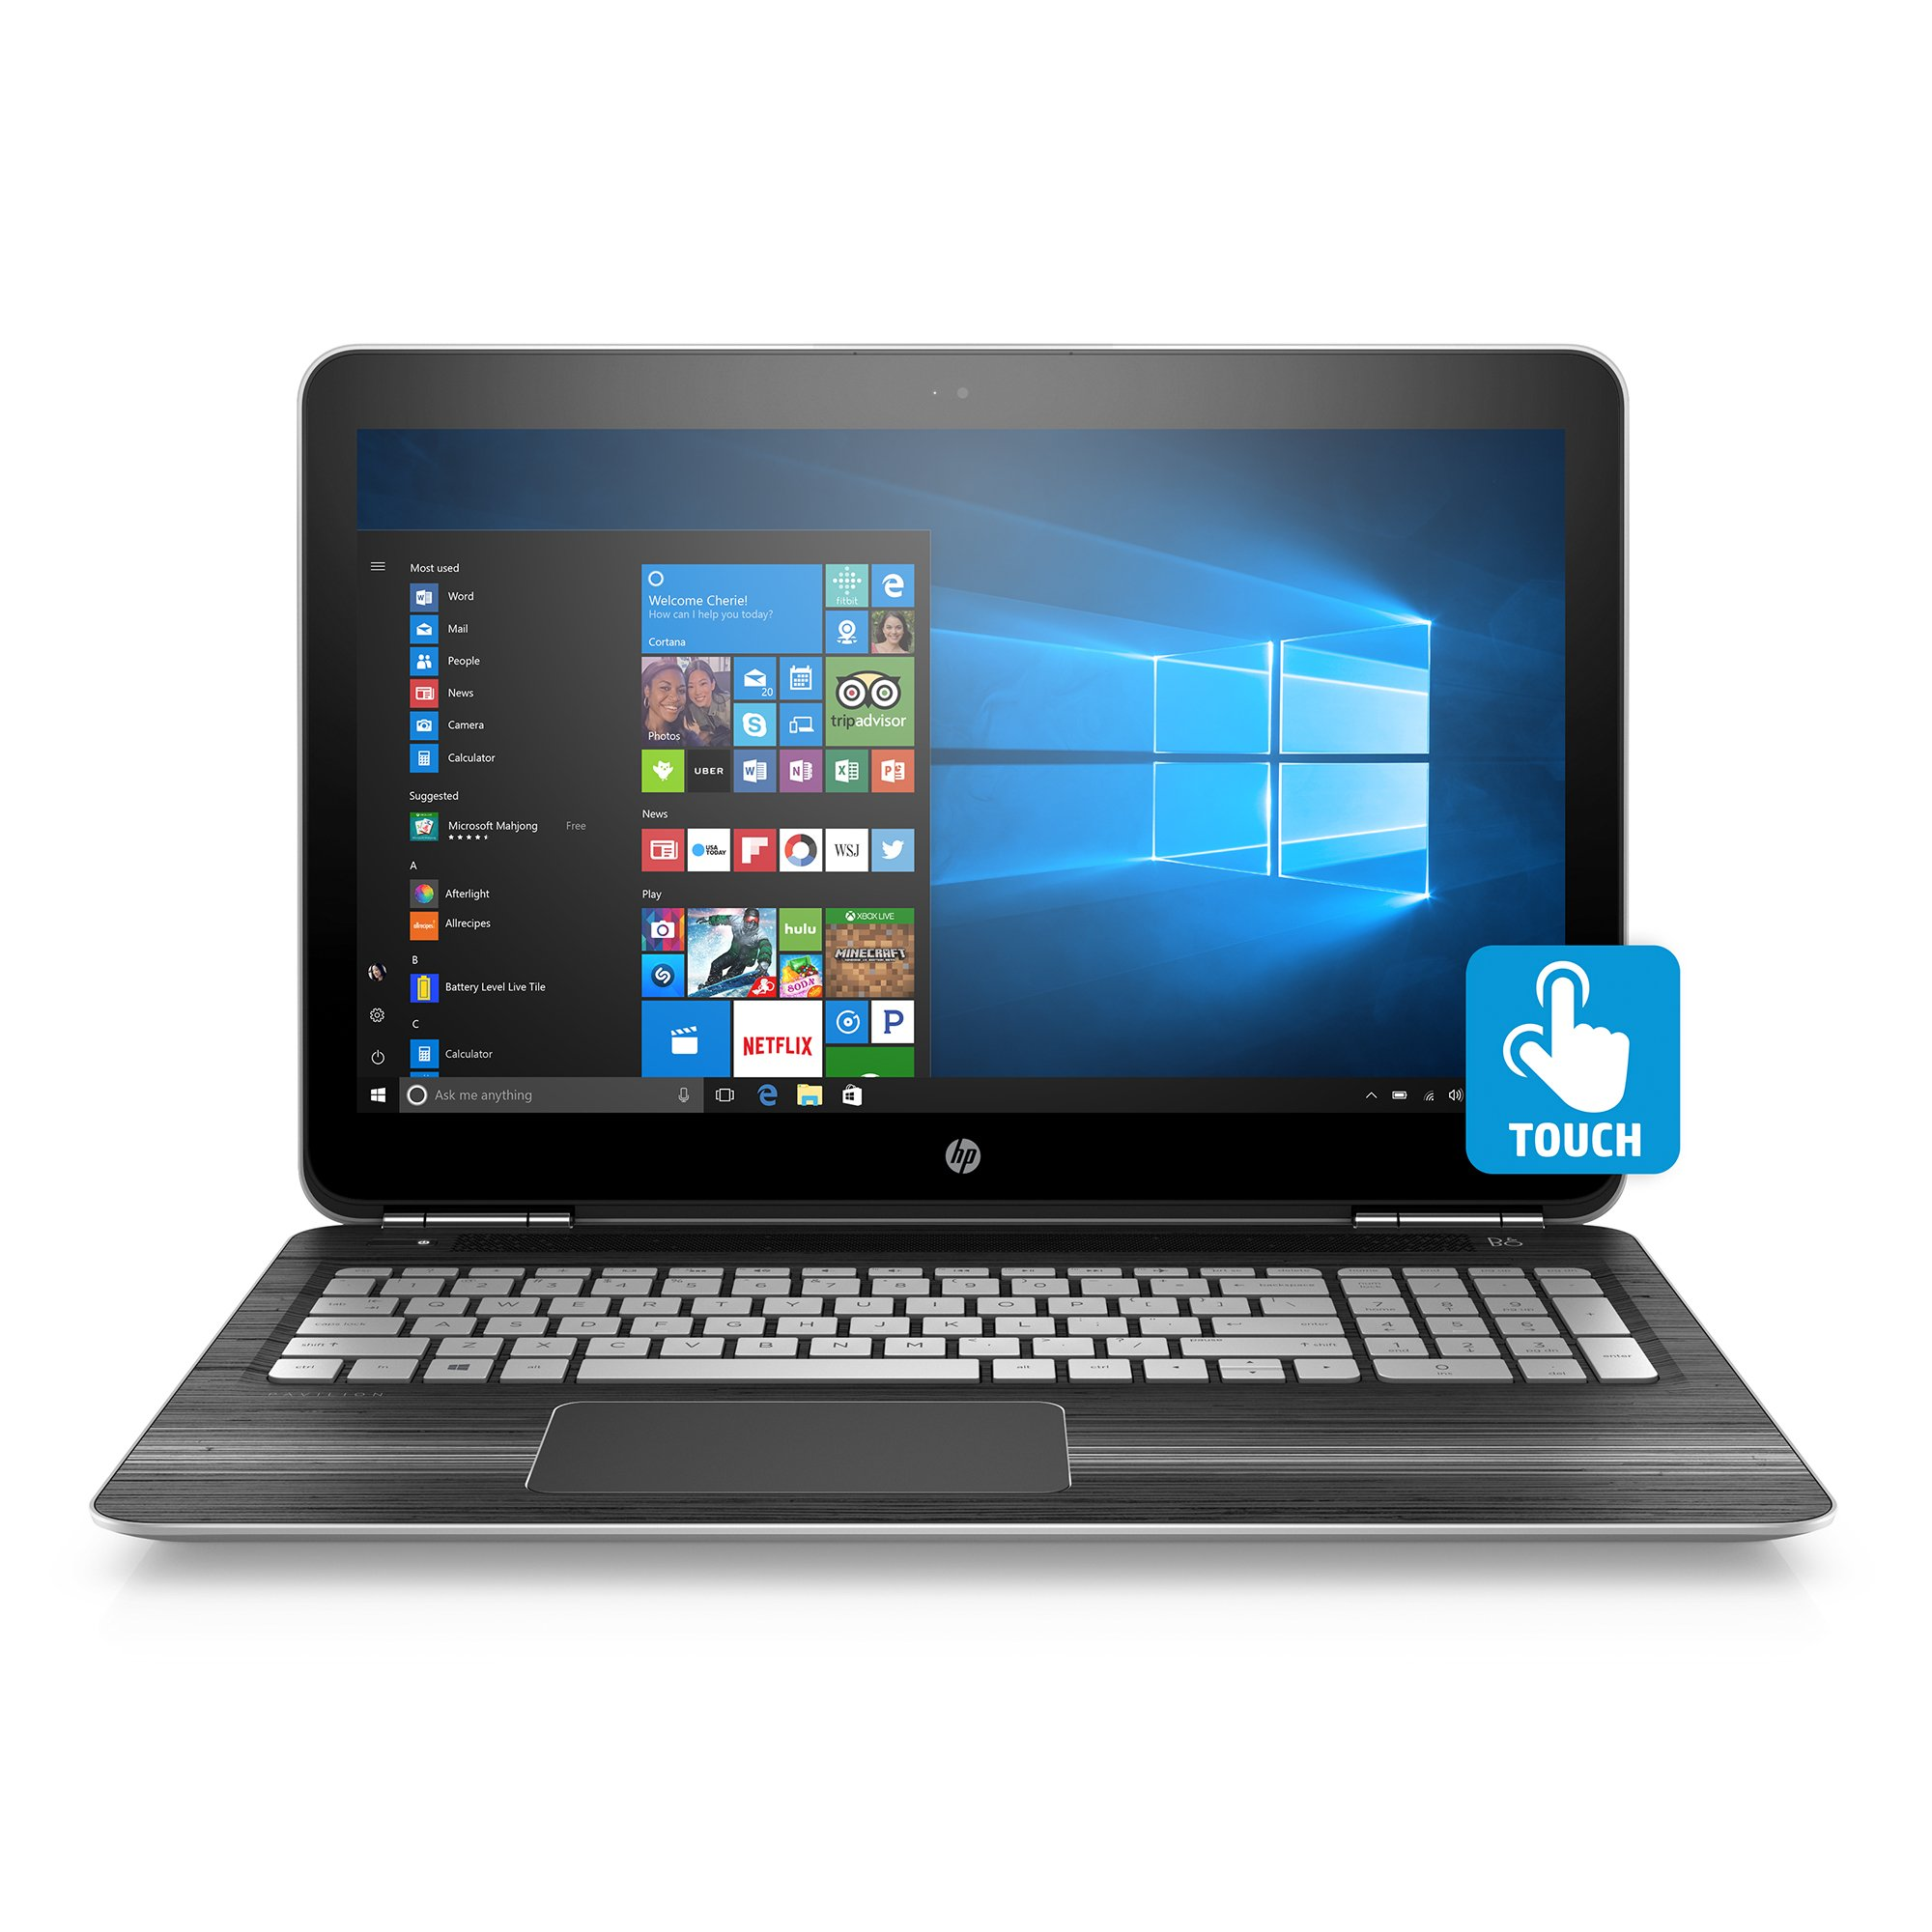 HP Pavilion 15-inch Laptop, Intel Core i5-7300HQ, NVIDIA GeForce GTX 1050, 12GB RAM, 1TB hard drive, Windows 10 (15-bc220nr, Silver)